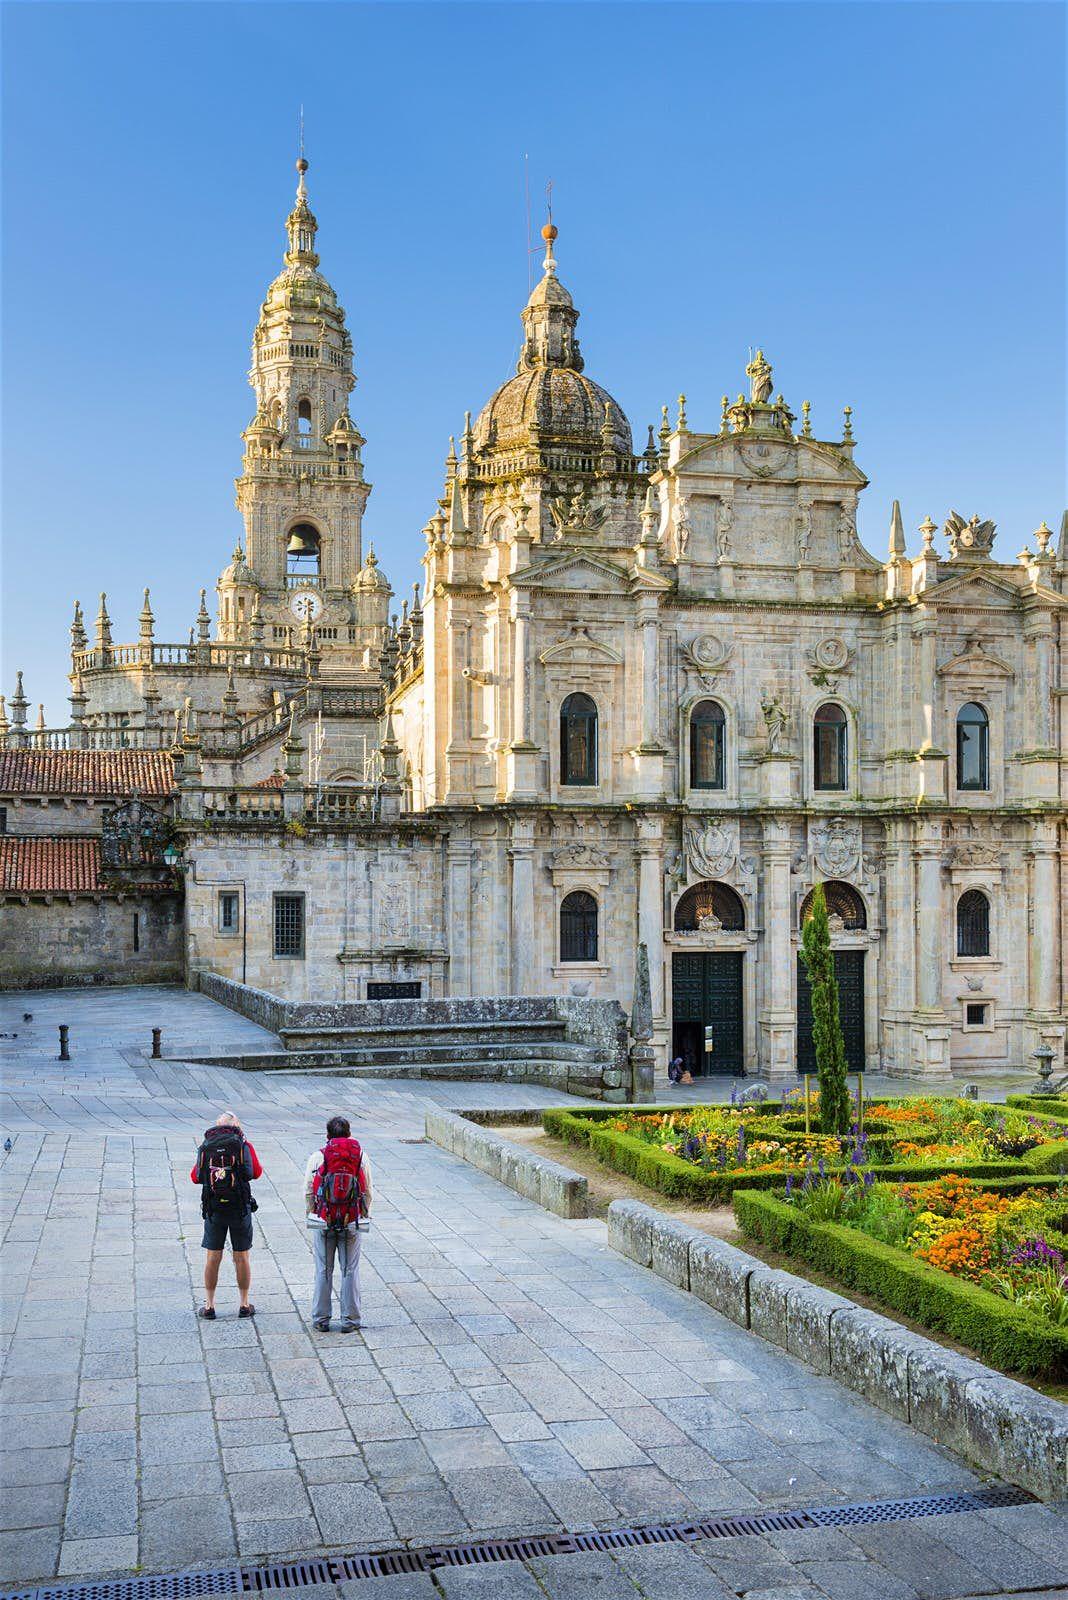 Walking The Camino De Santiago Highlights Of The Camino Francés Lonely Planet Camino De Santiago The Camino Spain Travel